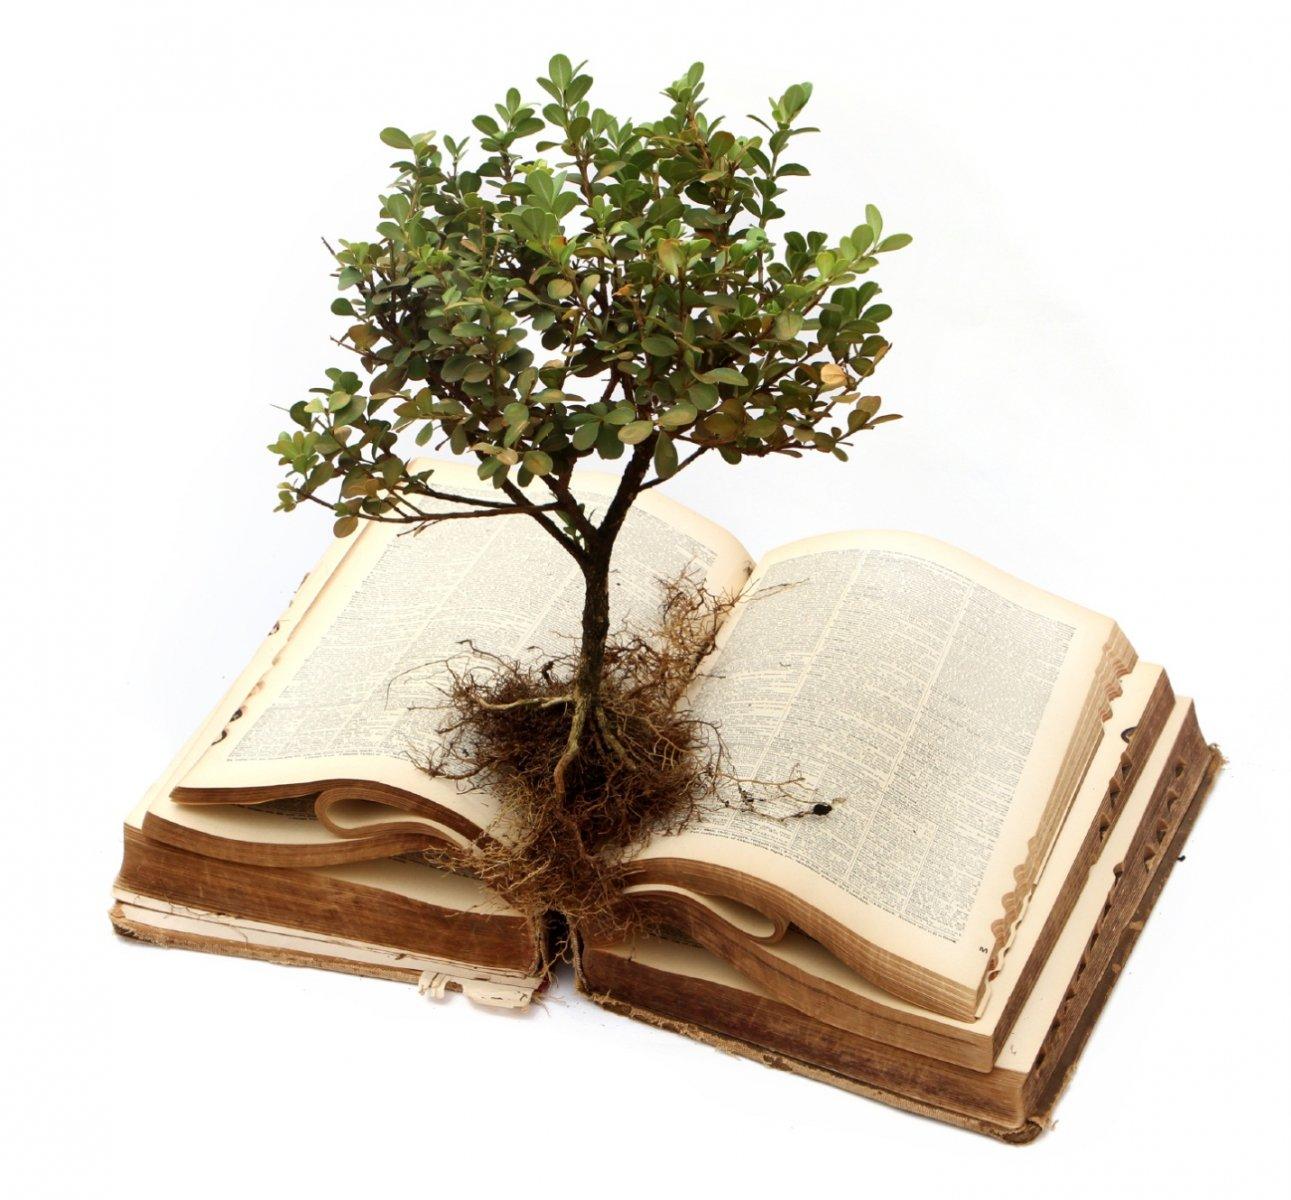 large.roots.jpg.509af689a97ad76836bf881a4d1c39f4.jpg